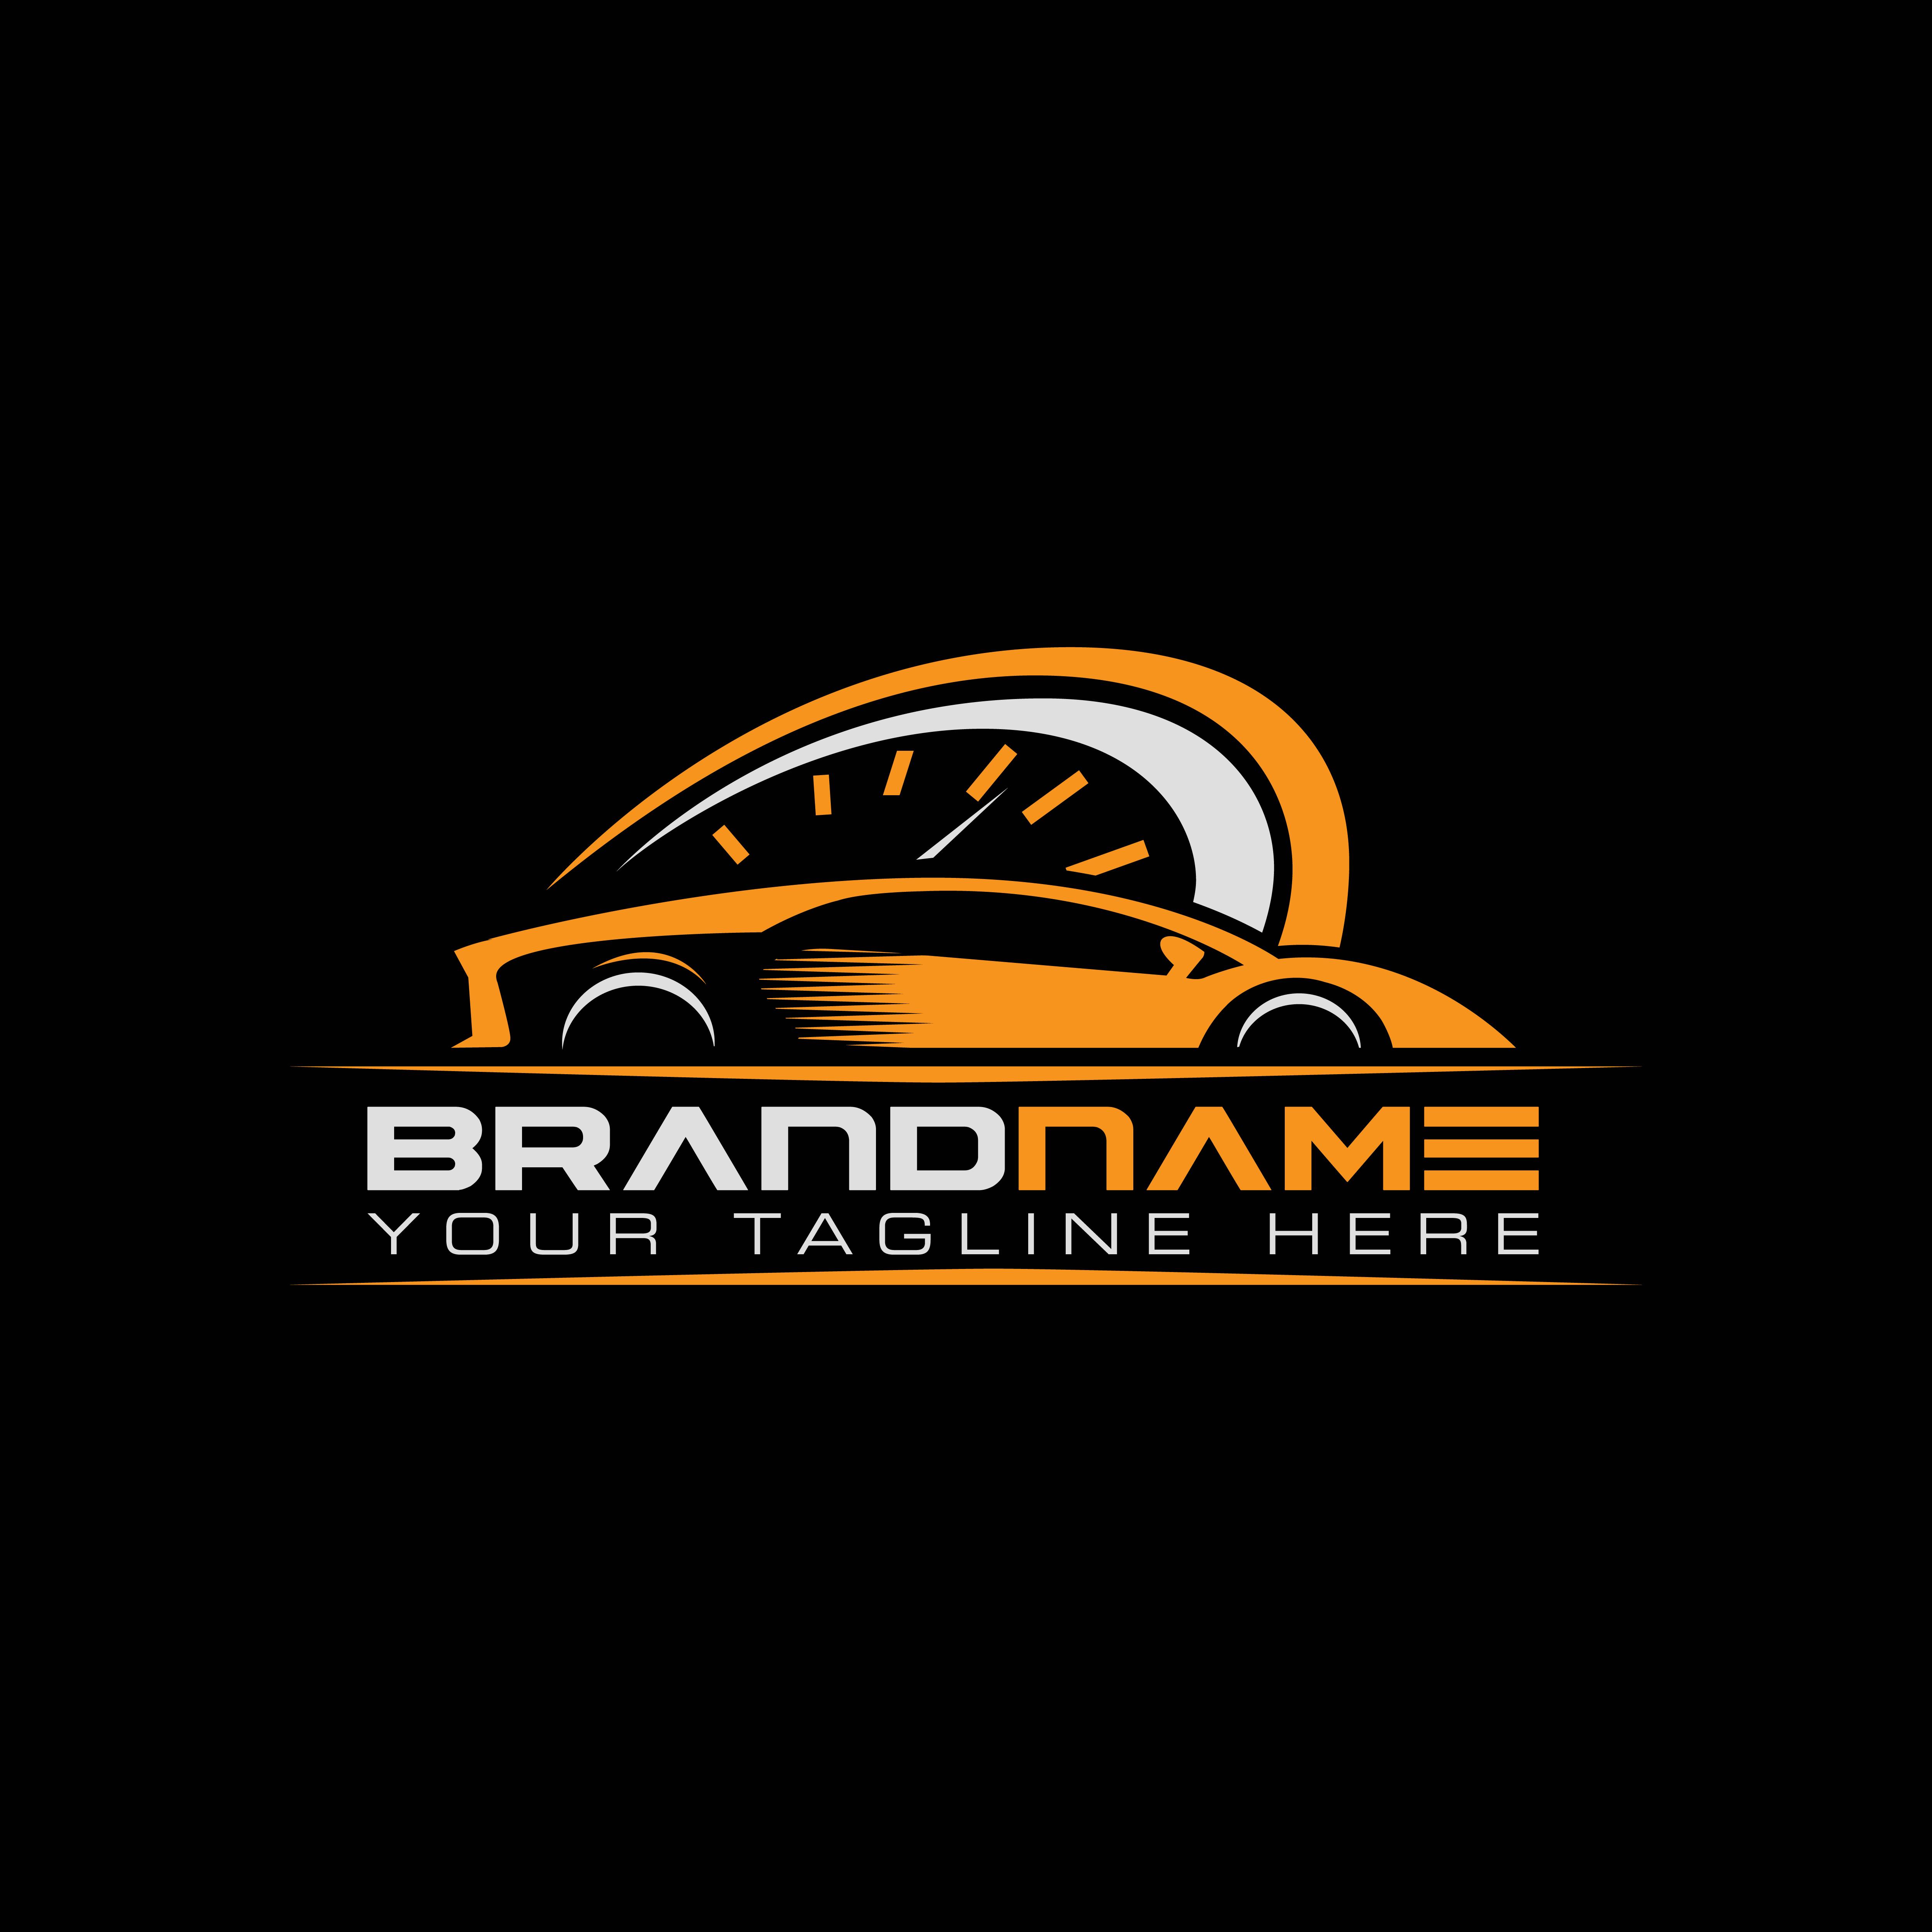 sport car with tachometer logo. Auto performance logo ...